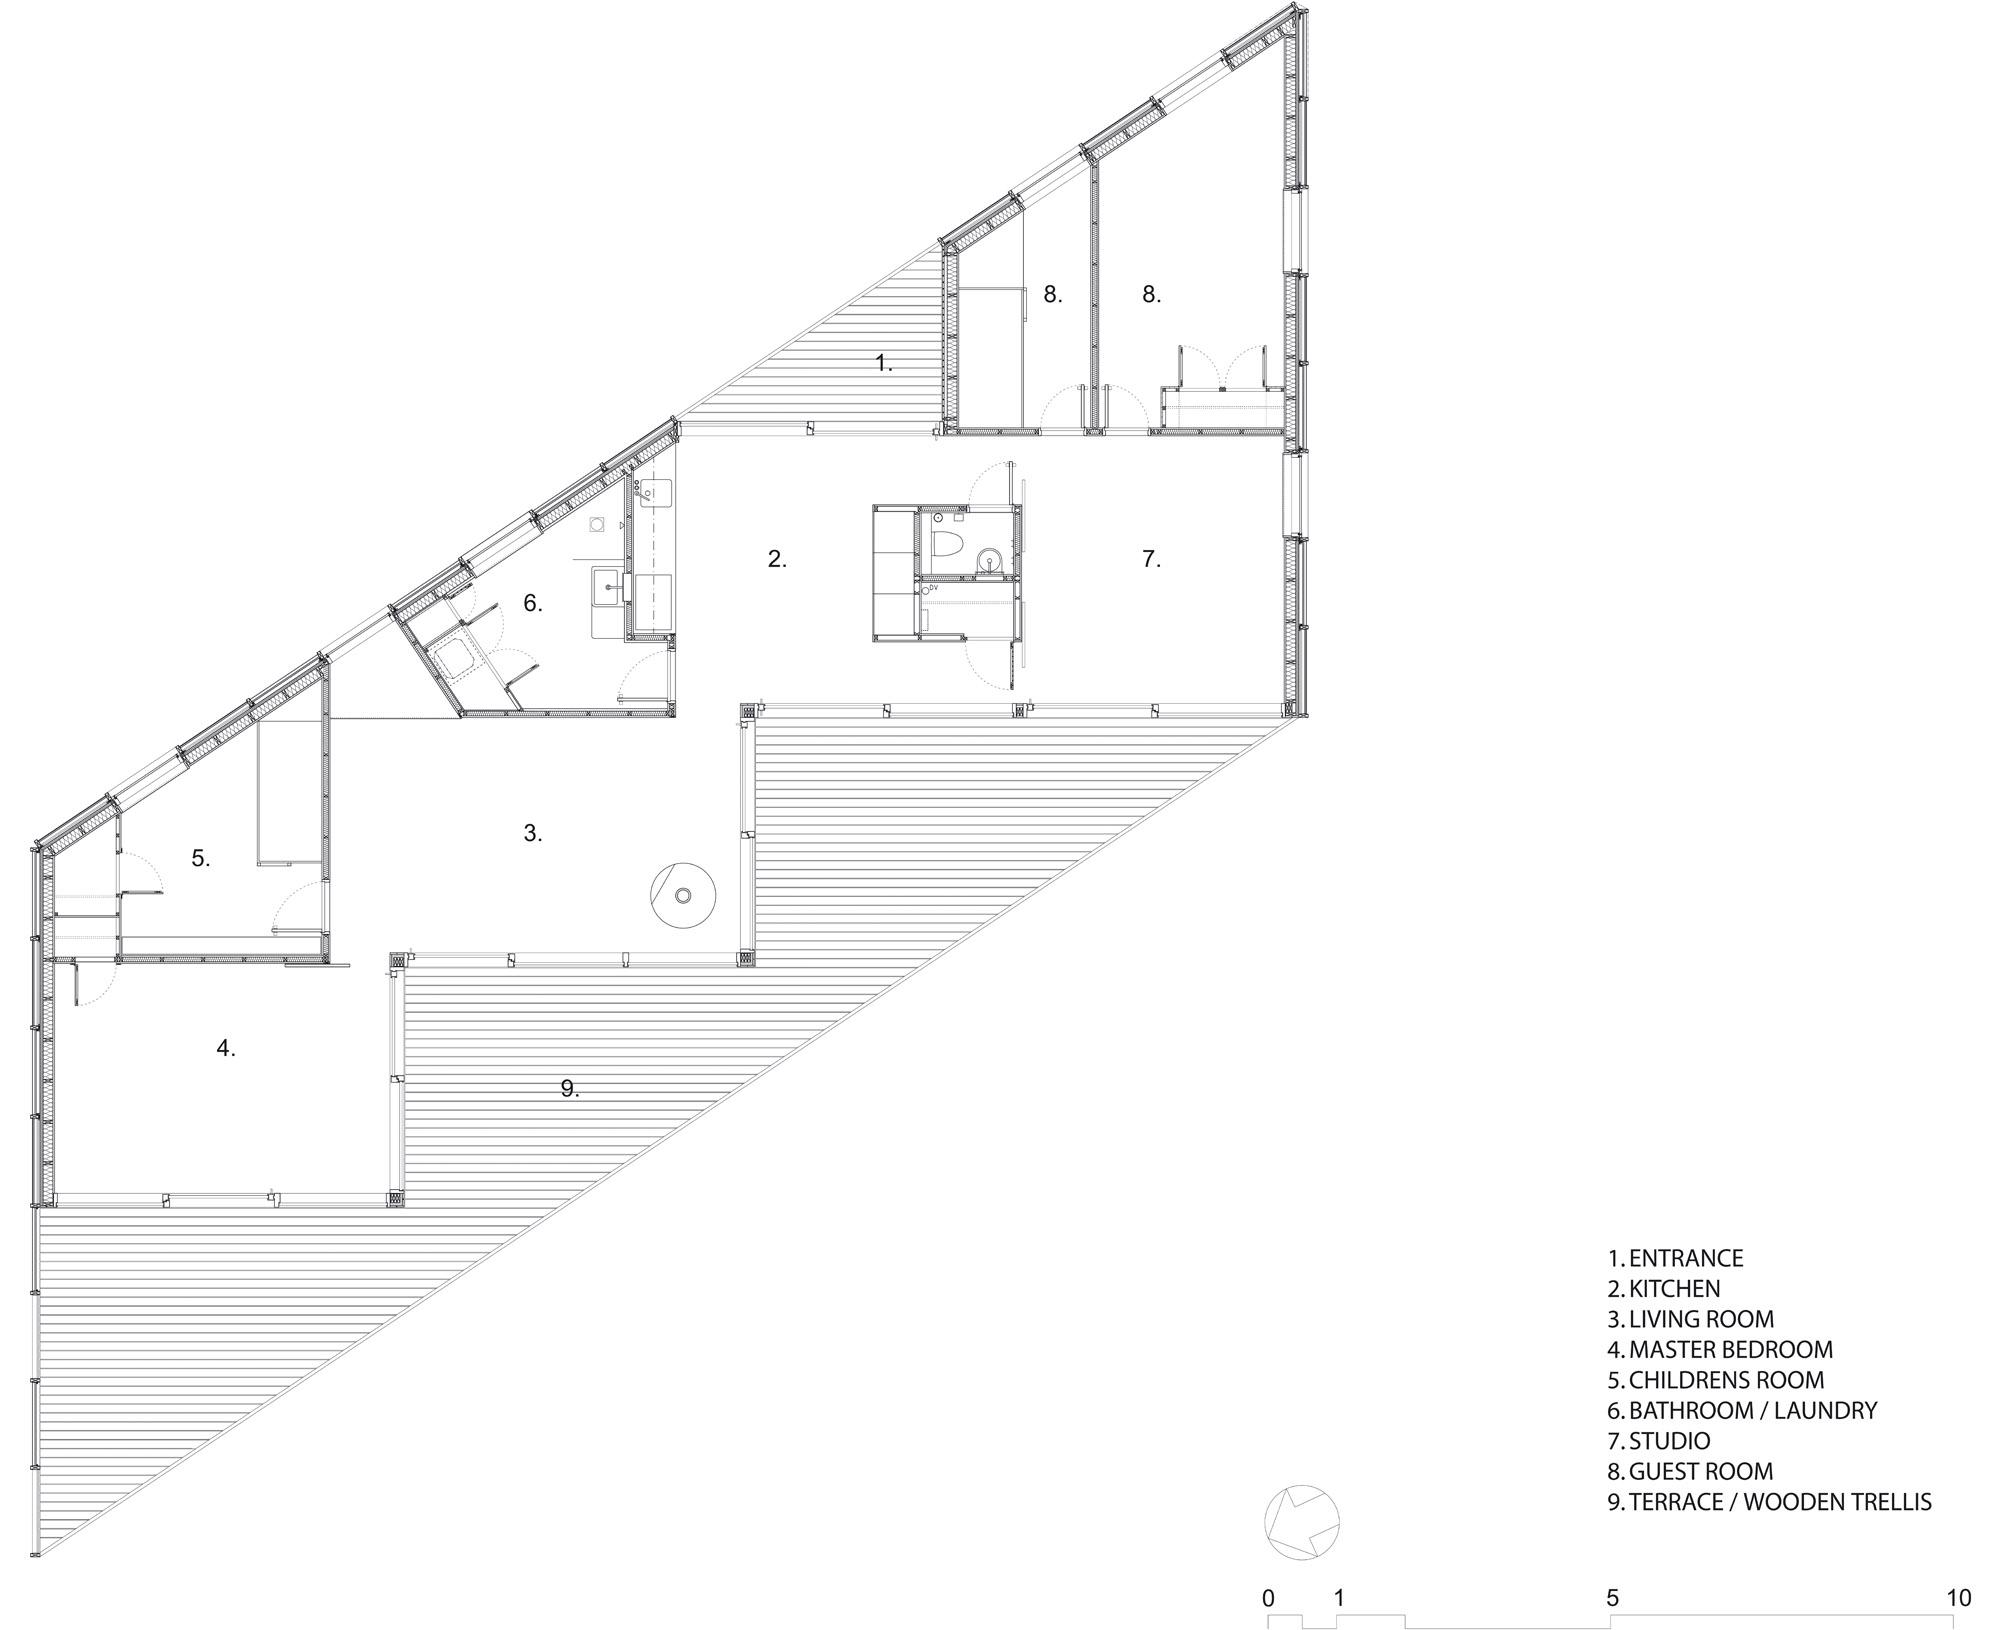 A302_01_PRESS 060905 Model (1) ground floor plan